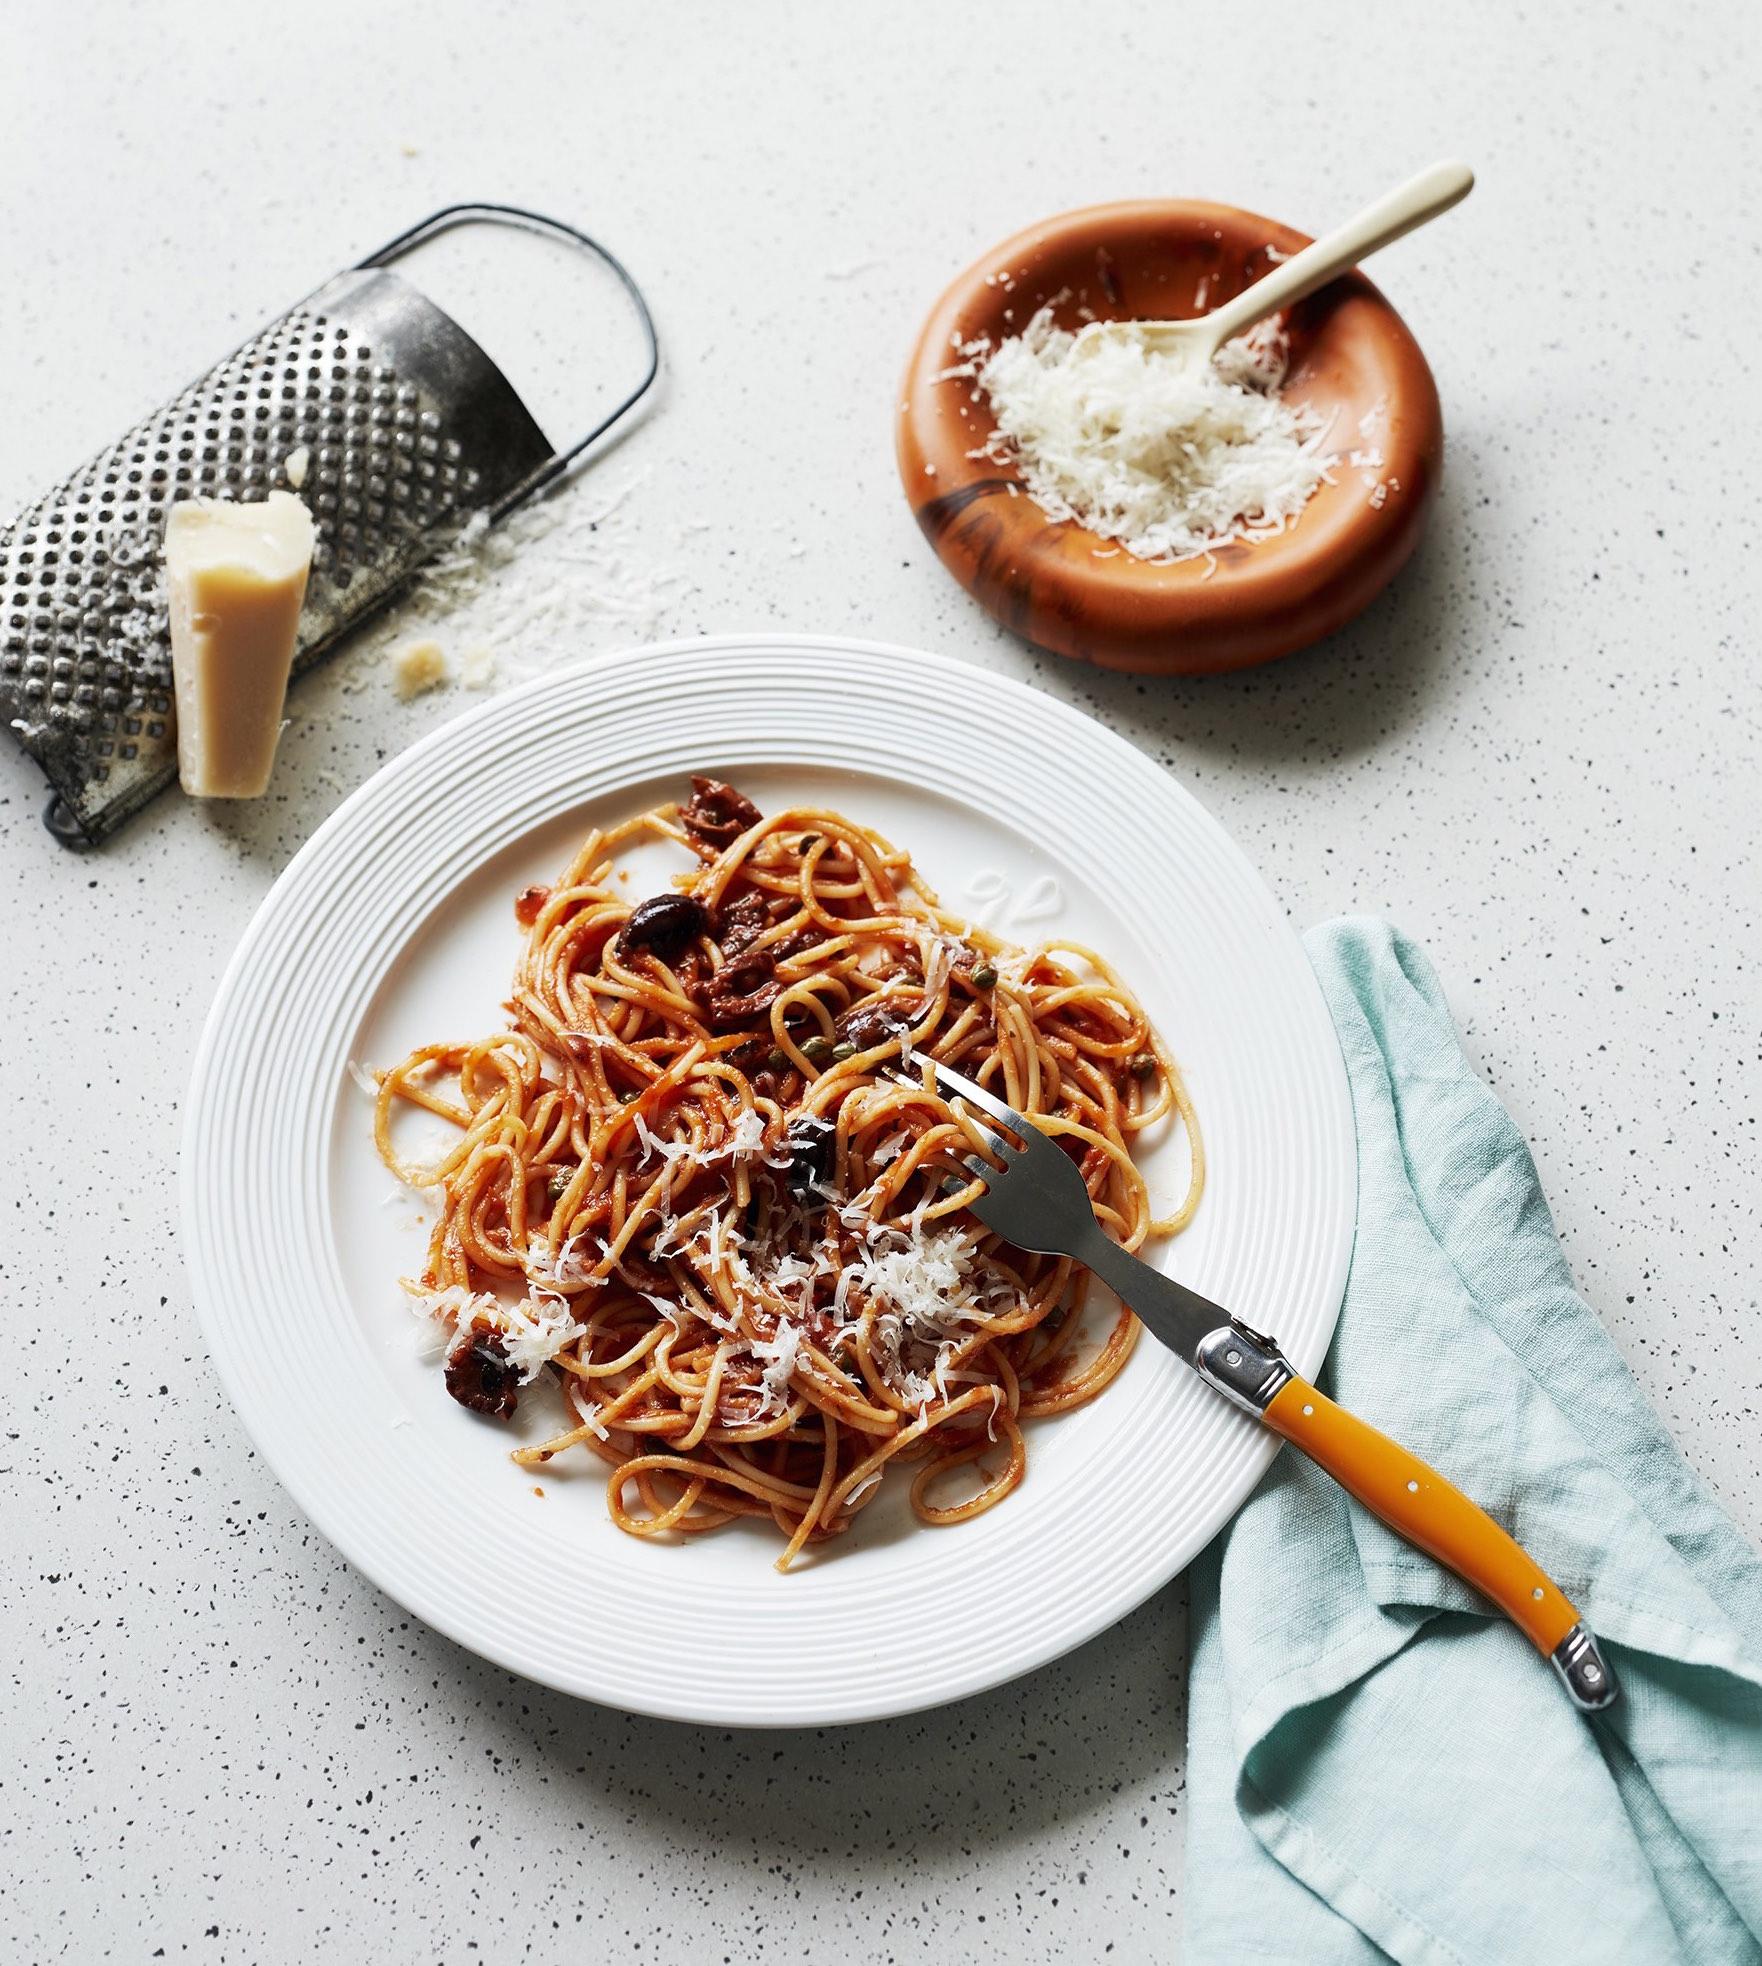 Food Styling by Kerrie-Ann Jones Interior Stylist Sydney & Melbourne.  Style Editor, Freelance Stylist.  Content Creator Sydney.  Food Stylist & Flatlay Stylist.  #foodstyling #tableinspiration #gourmettraveller